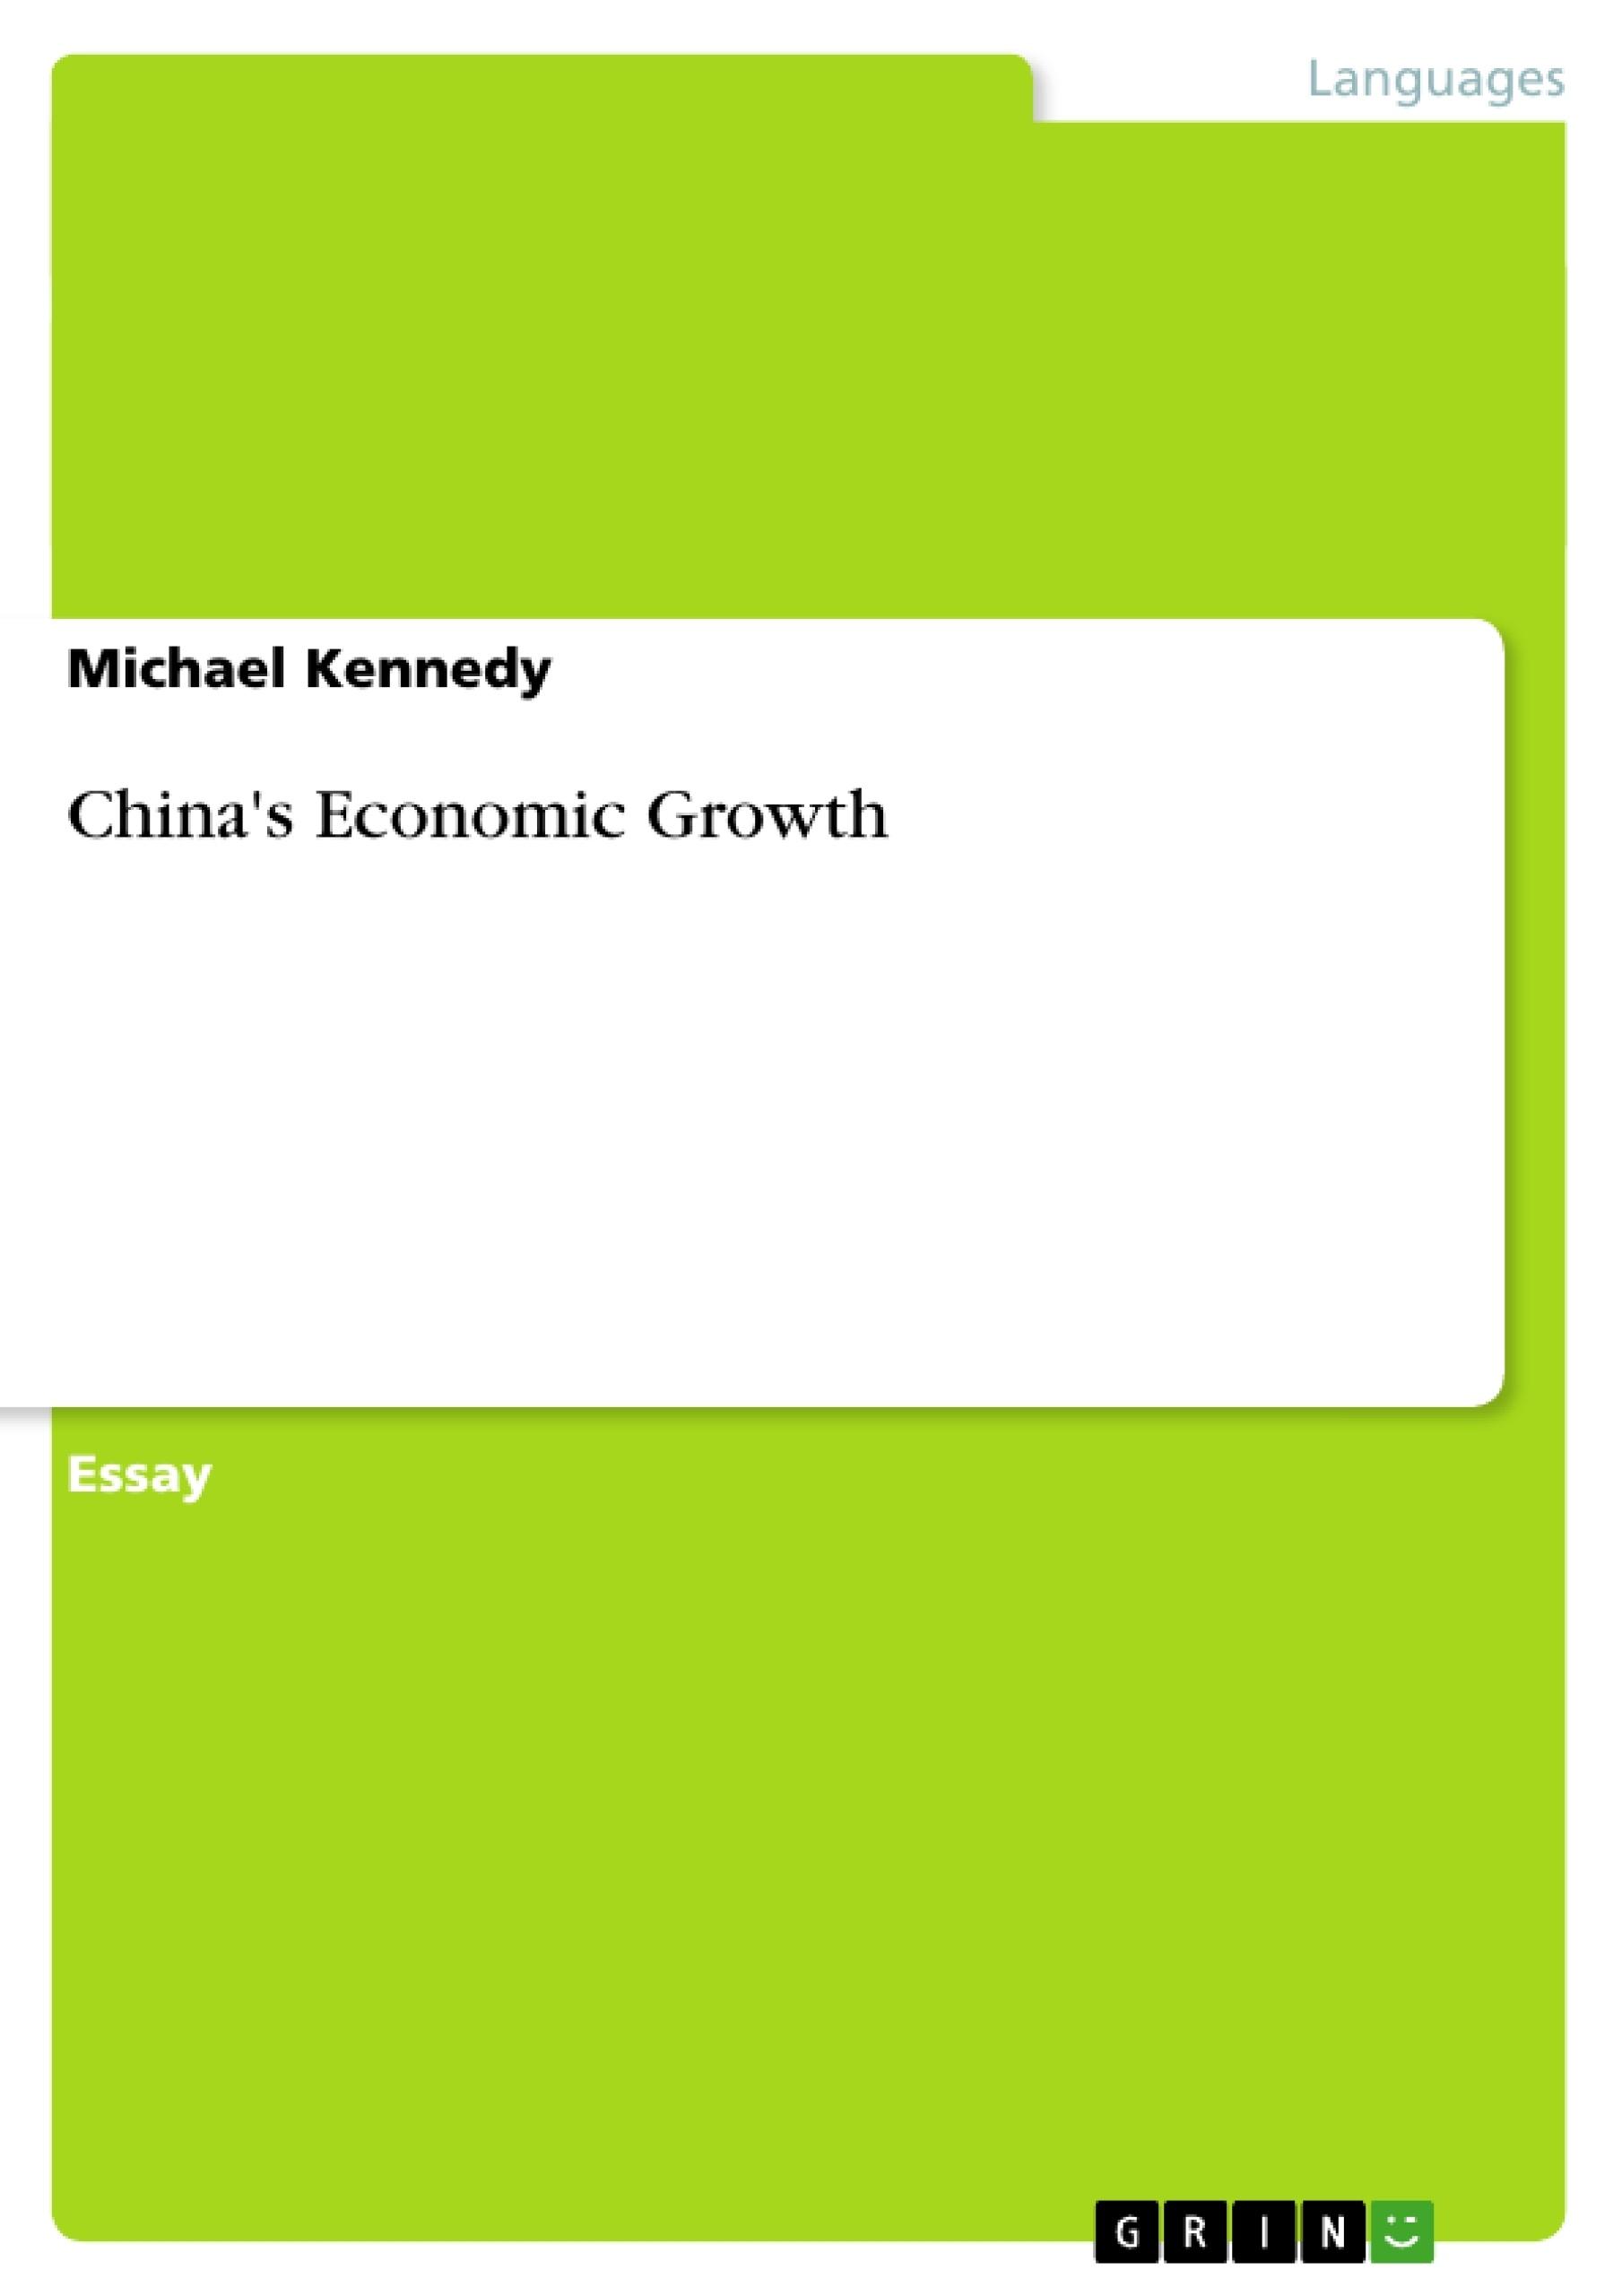 Title: China's Economic Growth